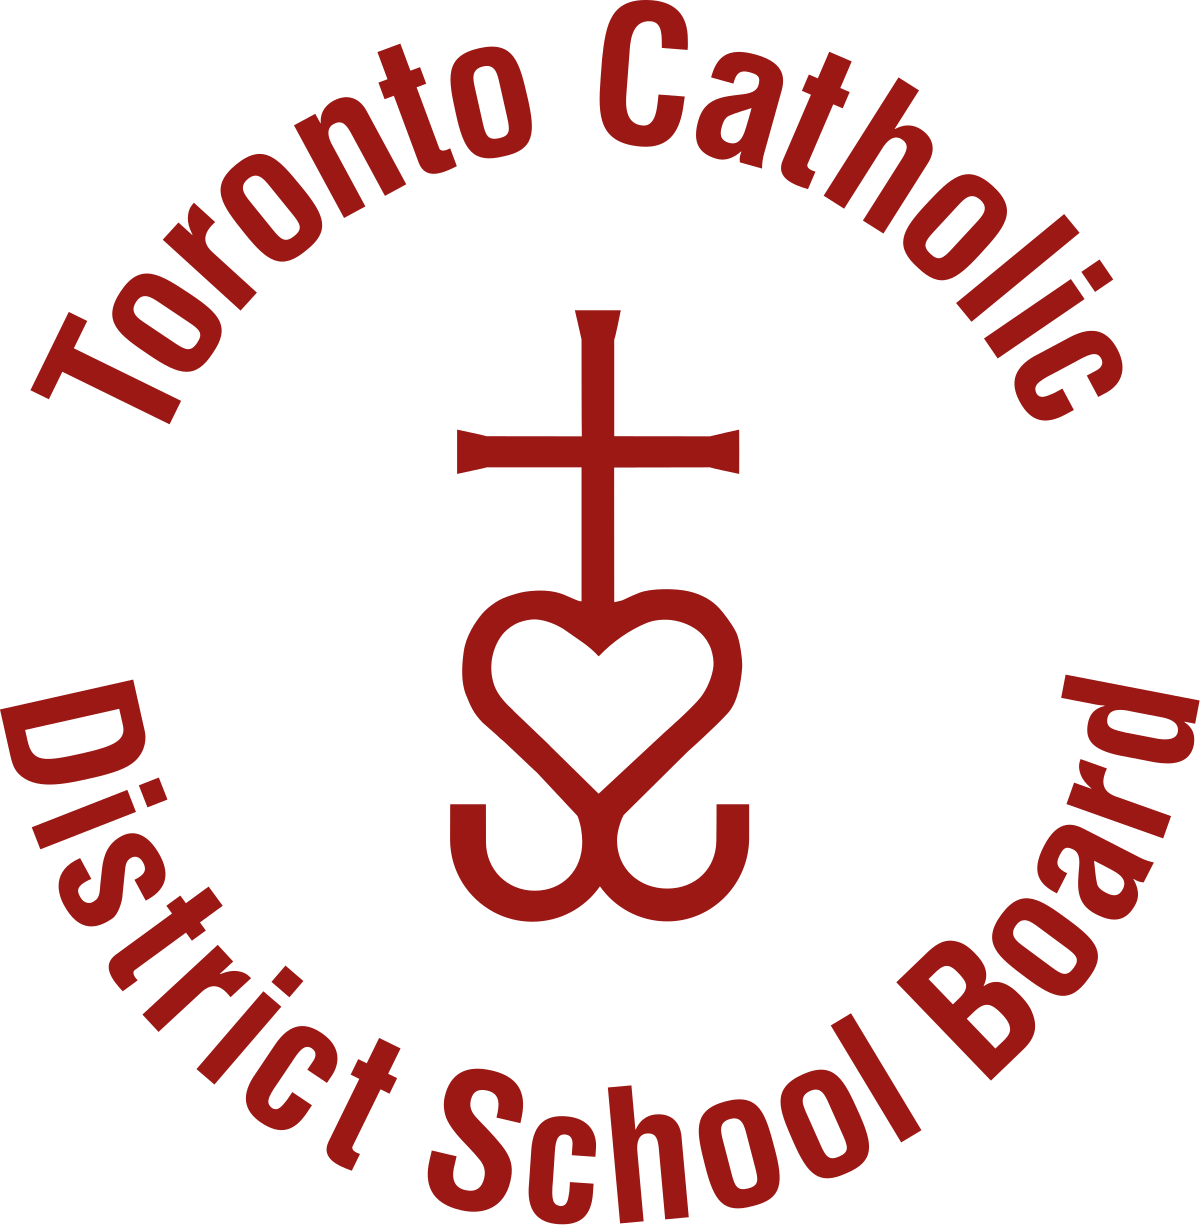 catholicschoolboard.png